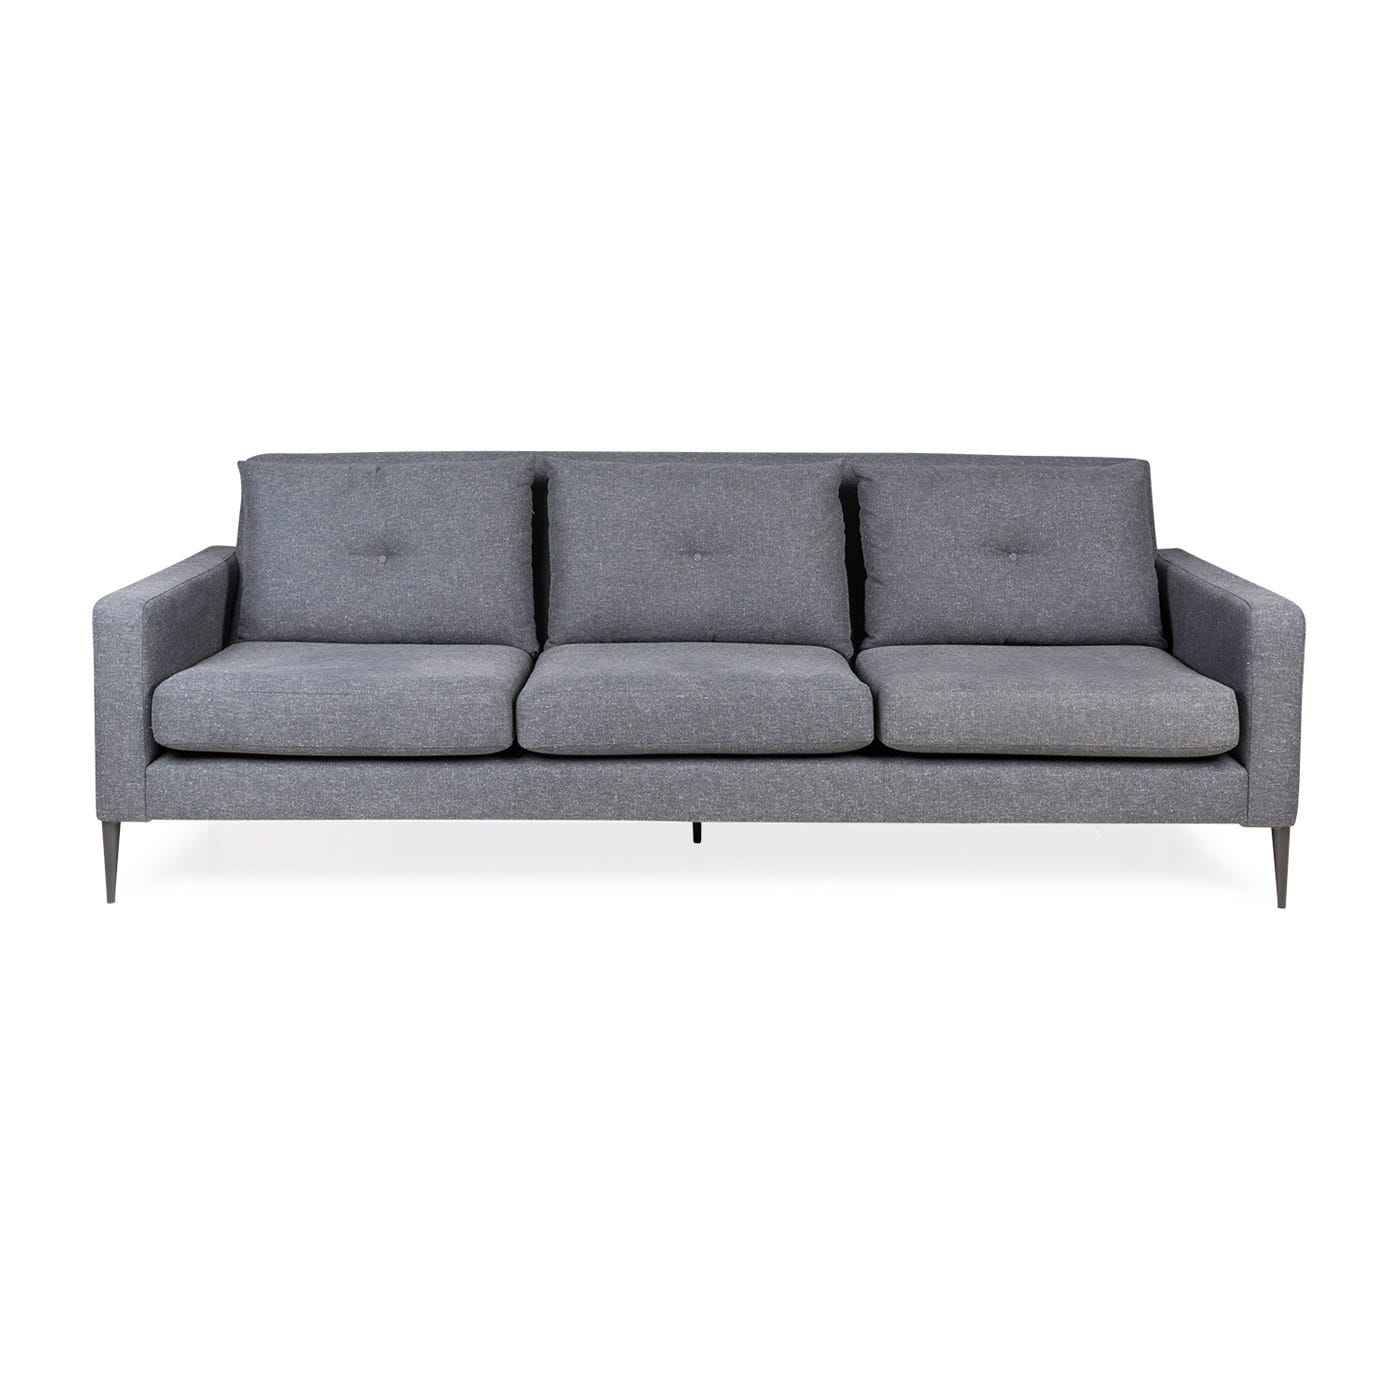 Brunel 4 Seater Sofa Murcia Grey  - Warehouse Sale